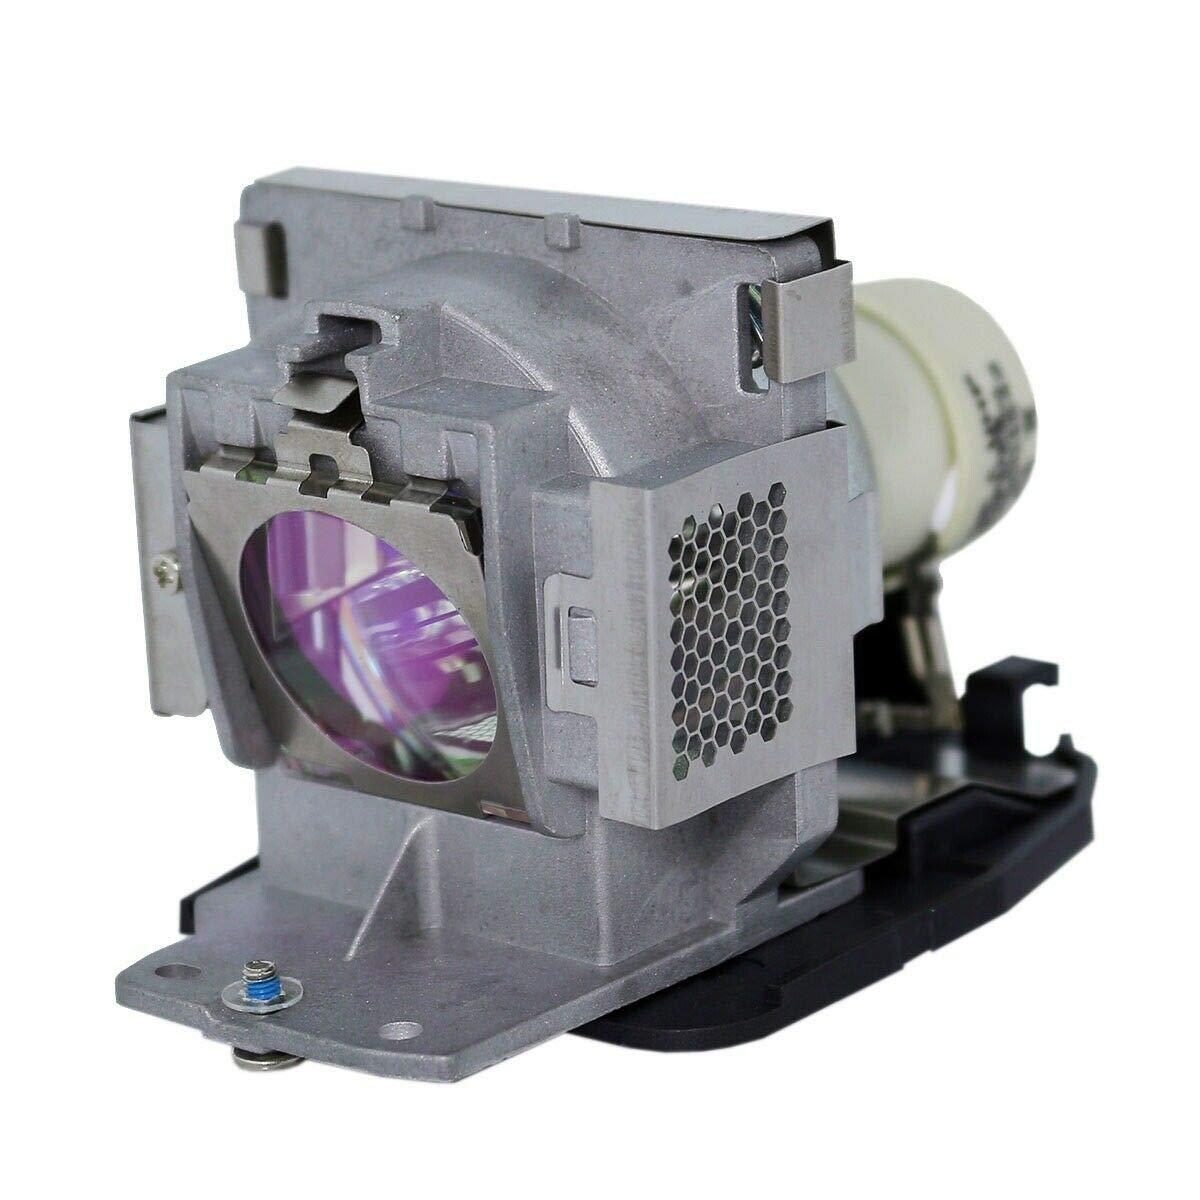 5J.06001.001, 5J.08G01.001, 5J.Y1E05.001 Replacememnt Lamp Bulb with Housing Compatible BENQ MP730 projectors